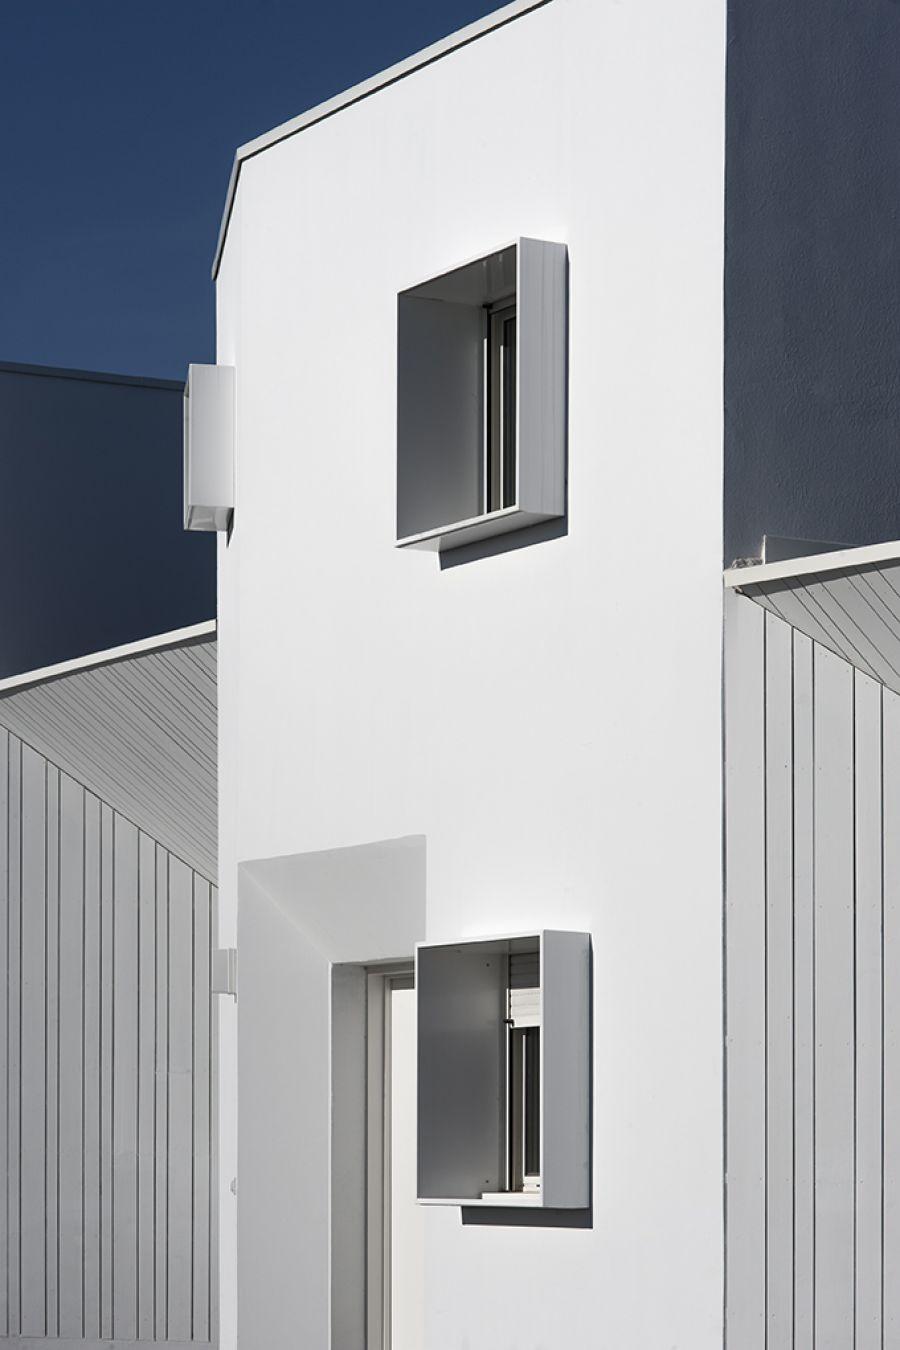 Résidence Jouanicot-Truillet à Anglet - Arch. Leibar & Seigneurin - Photo : Patrick Miara